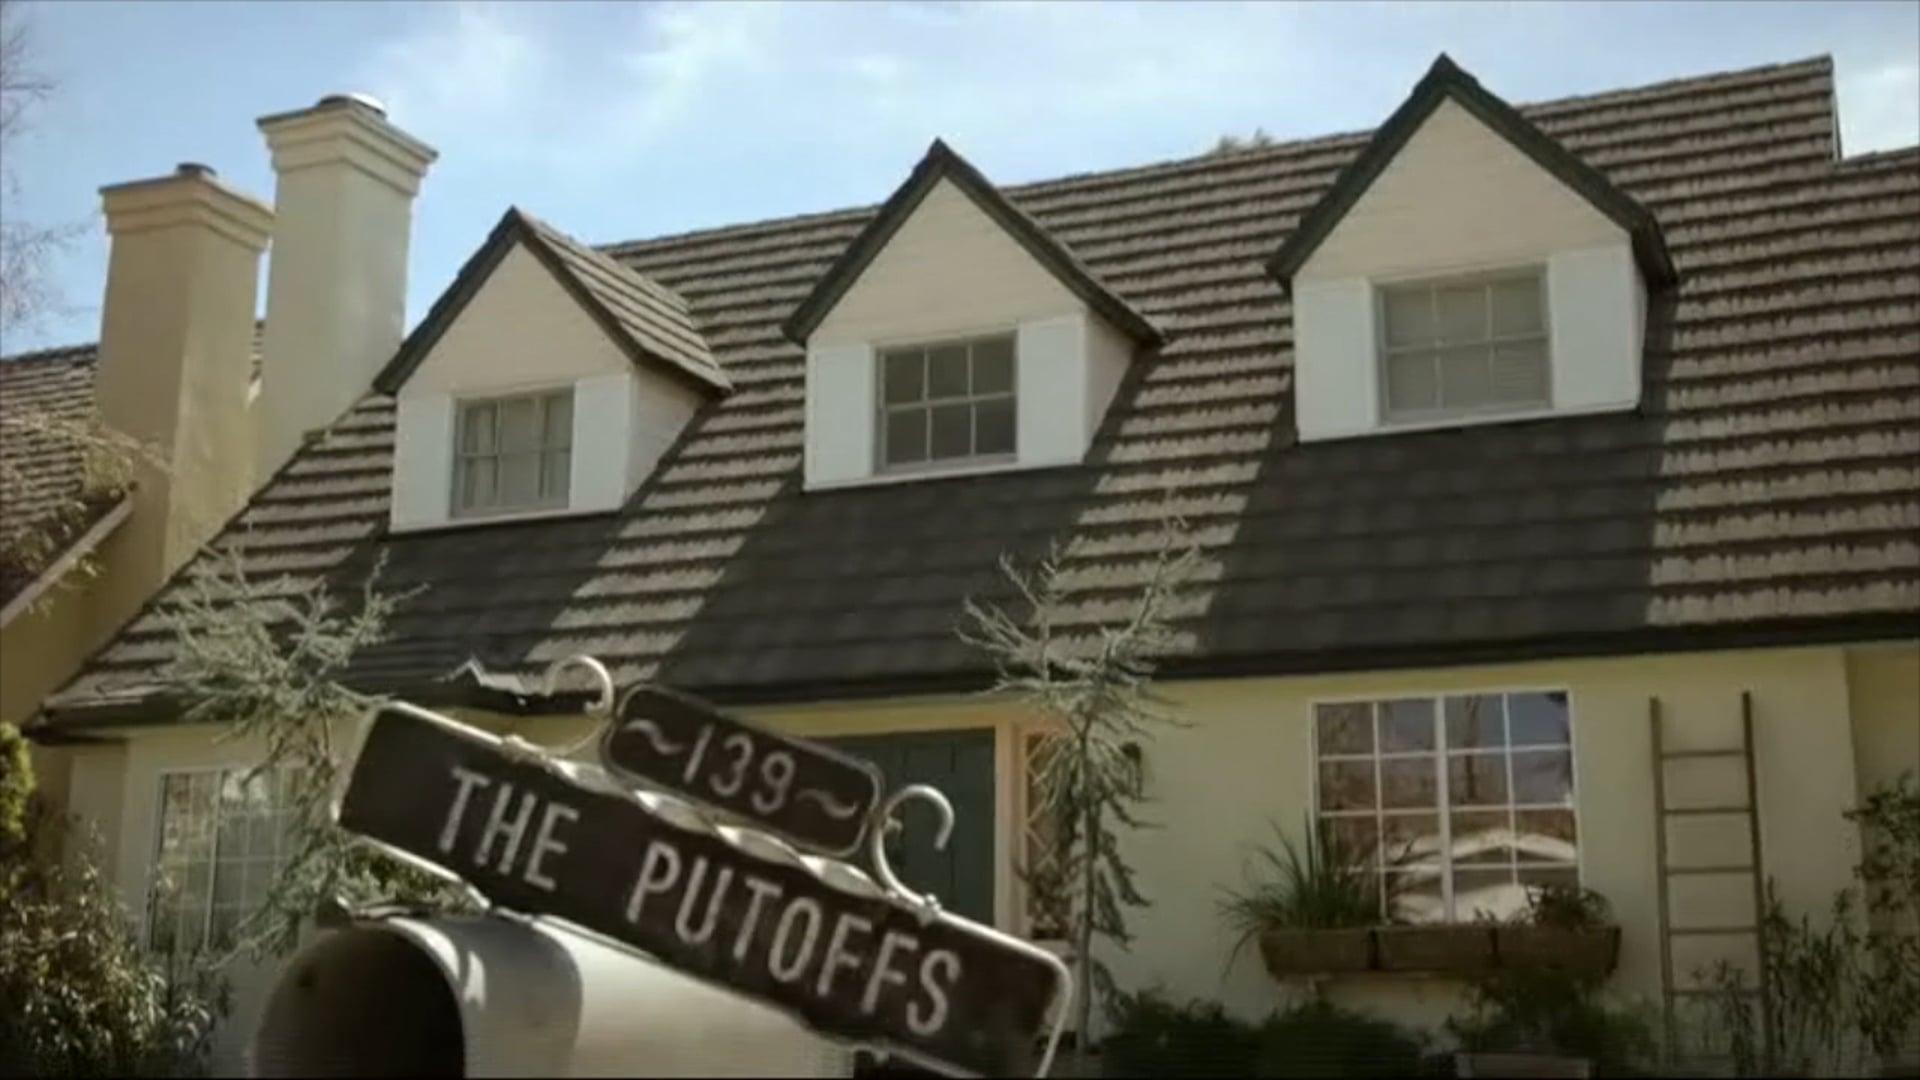 The_putoffs_the_thing